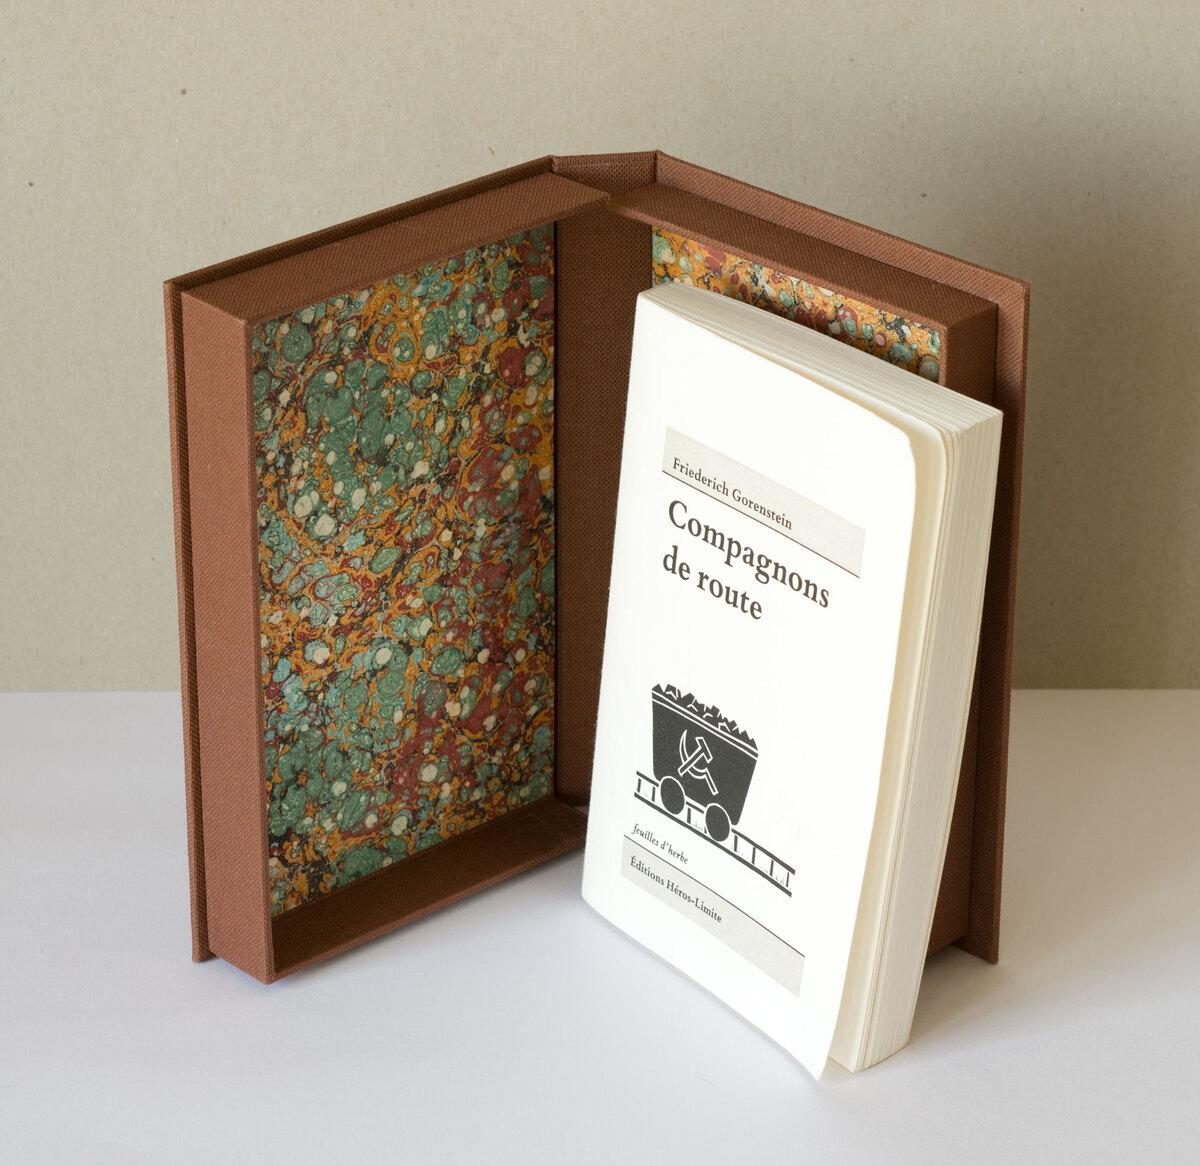 Boite toile marron et livre